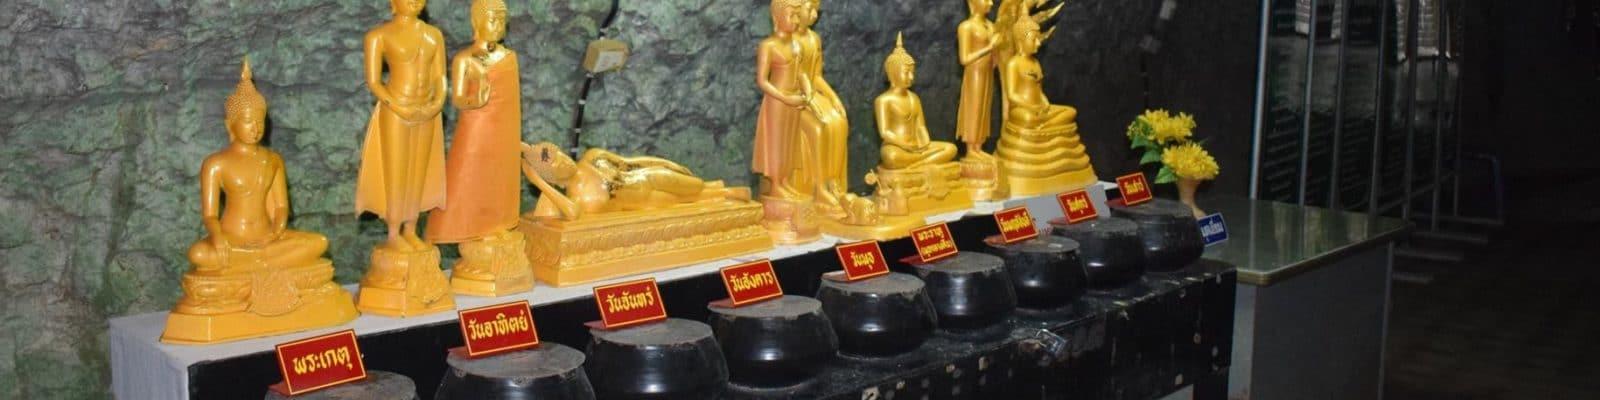 Sumano Cave. Le Wat Tham Sumano